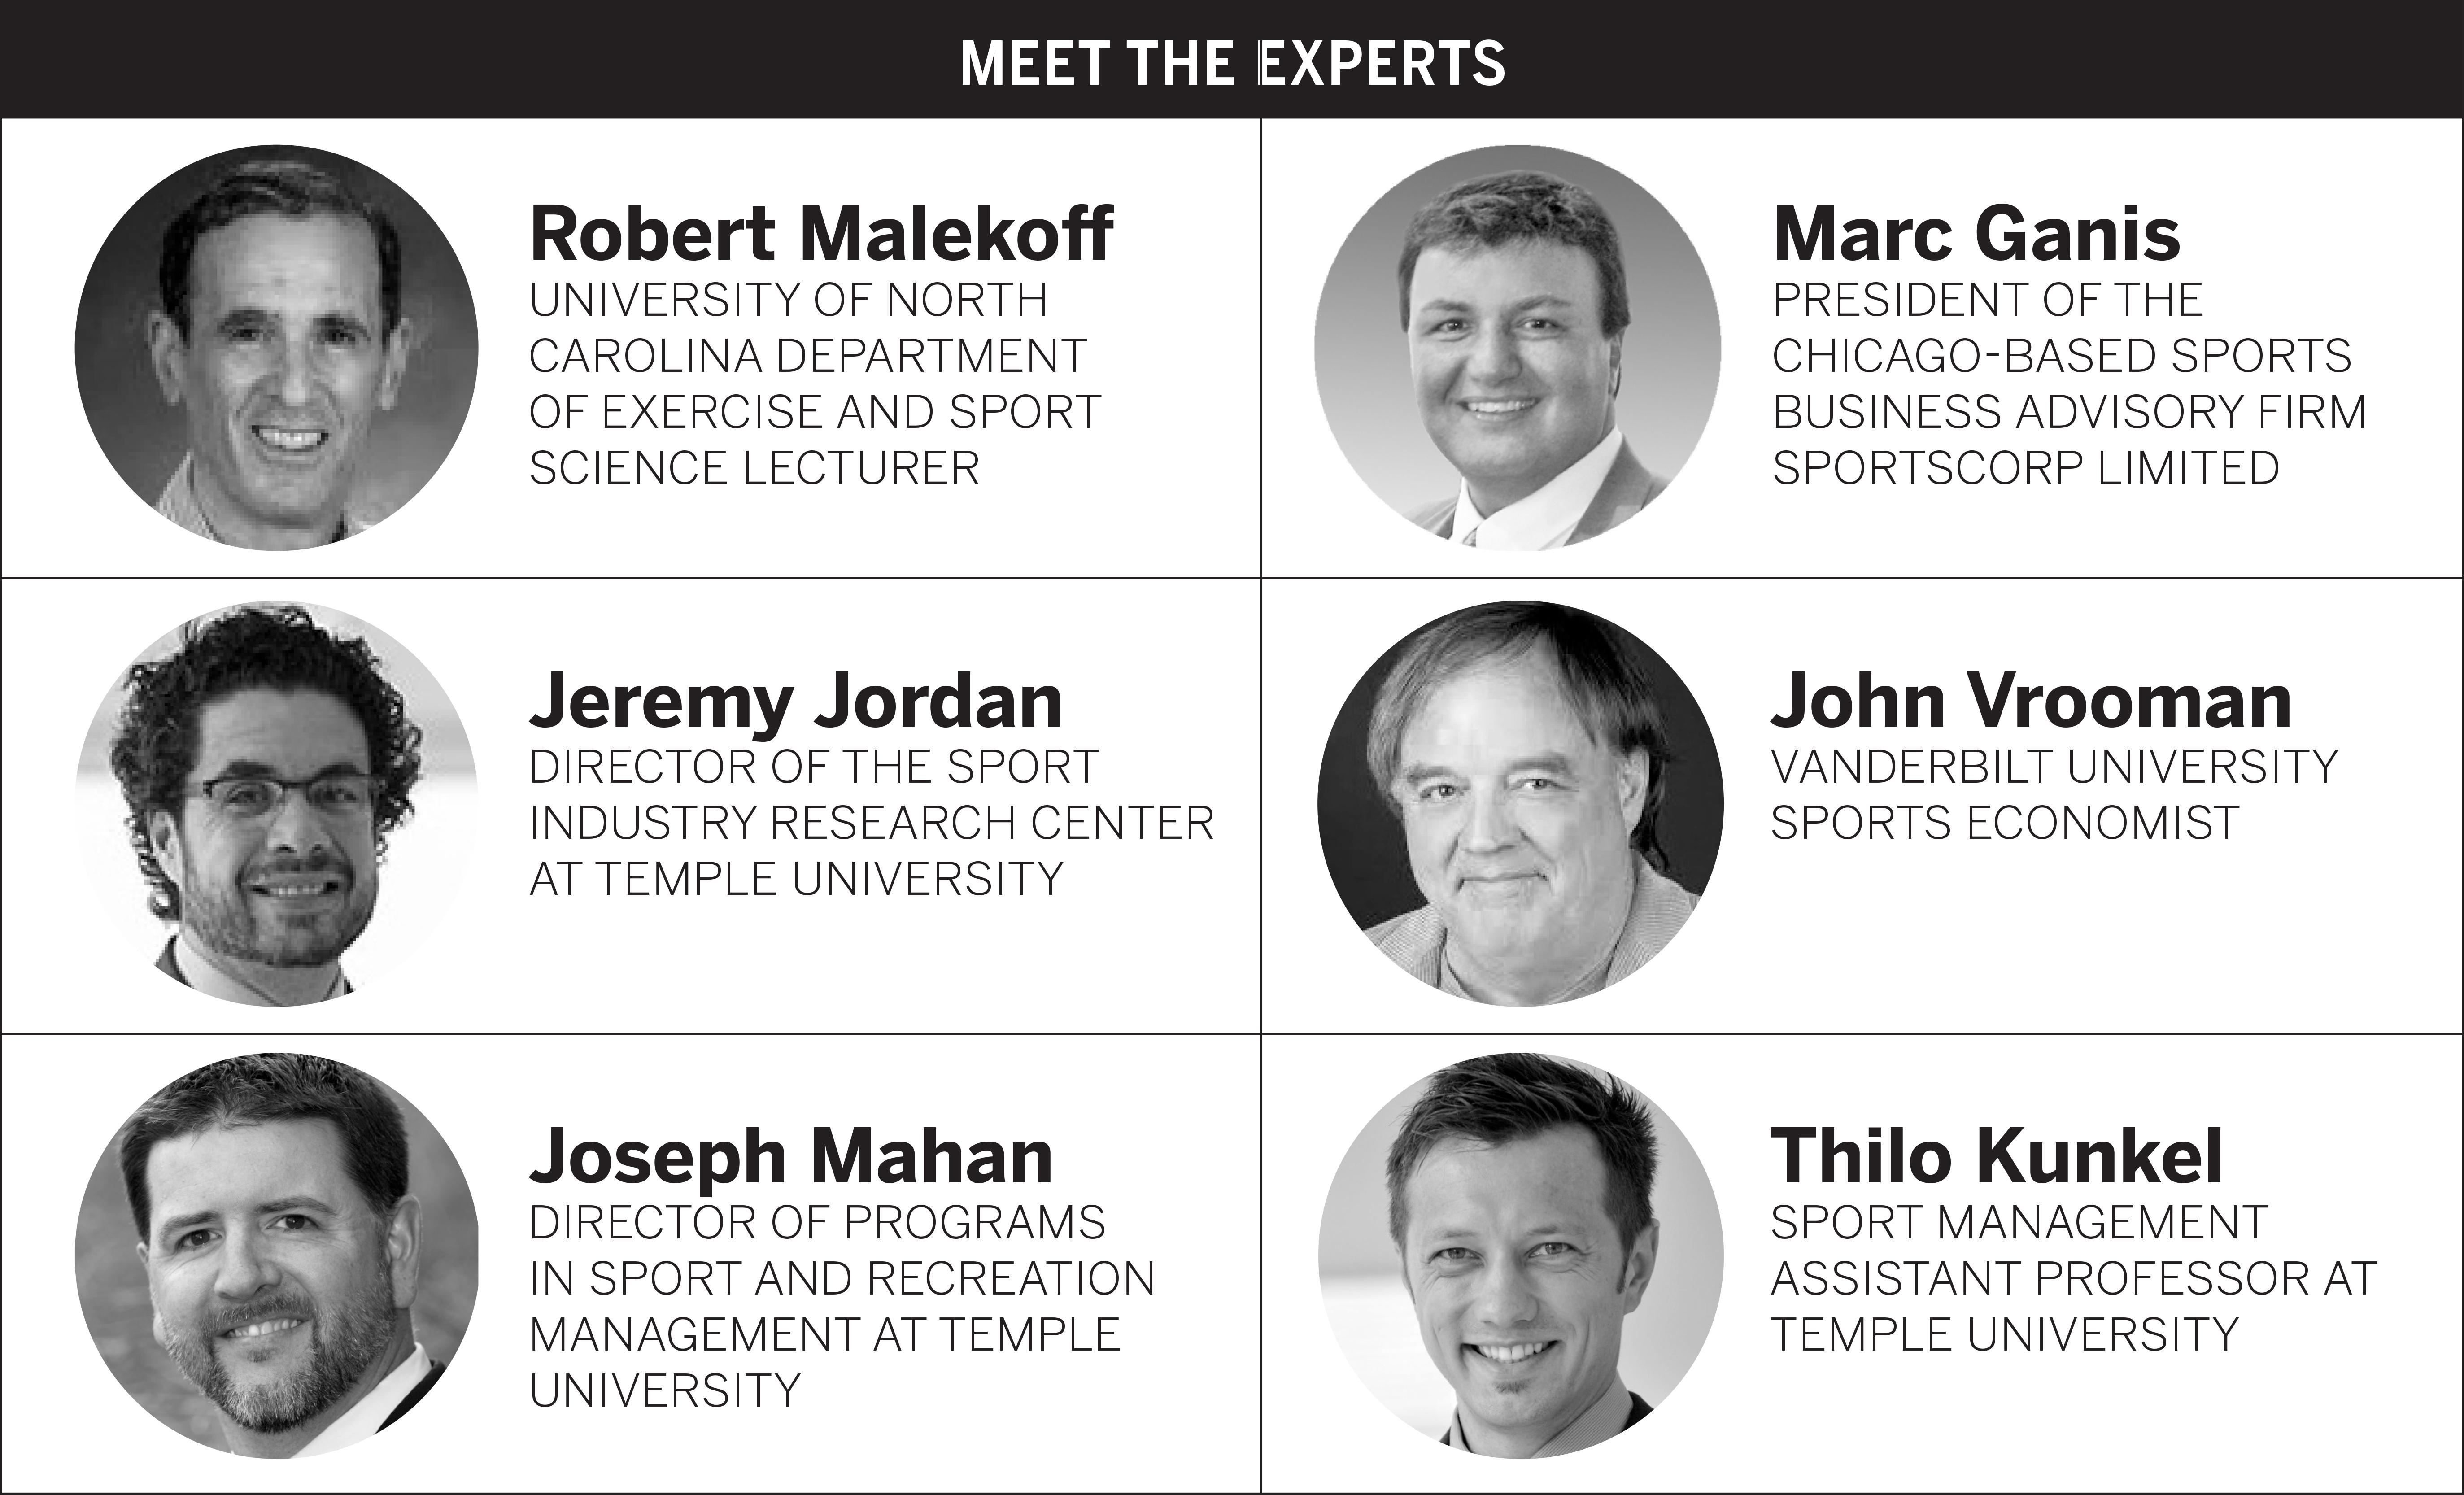 meet the experts2